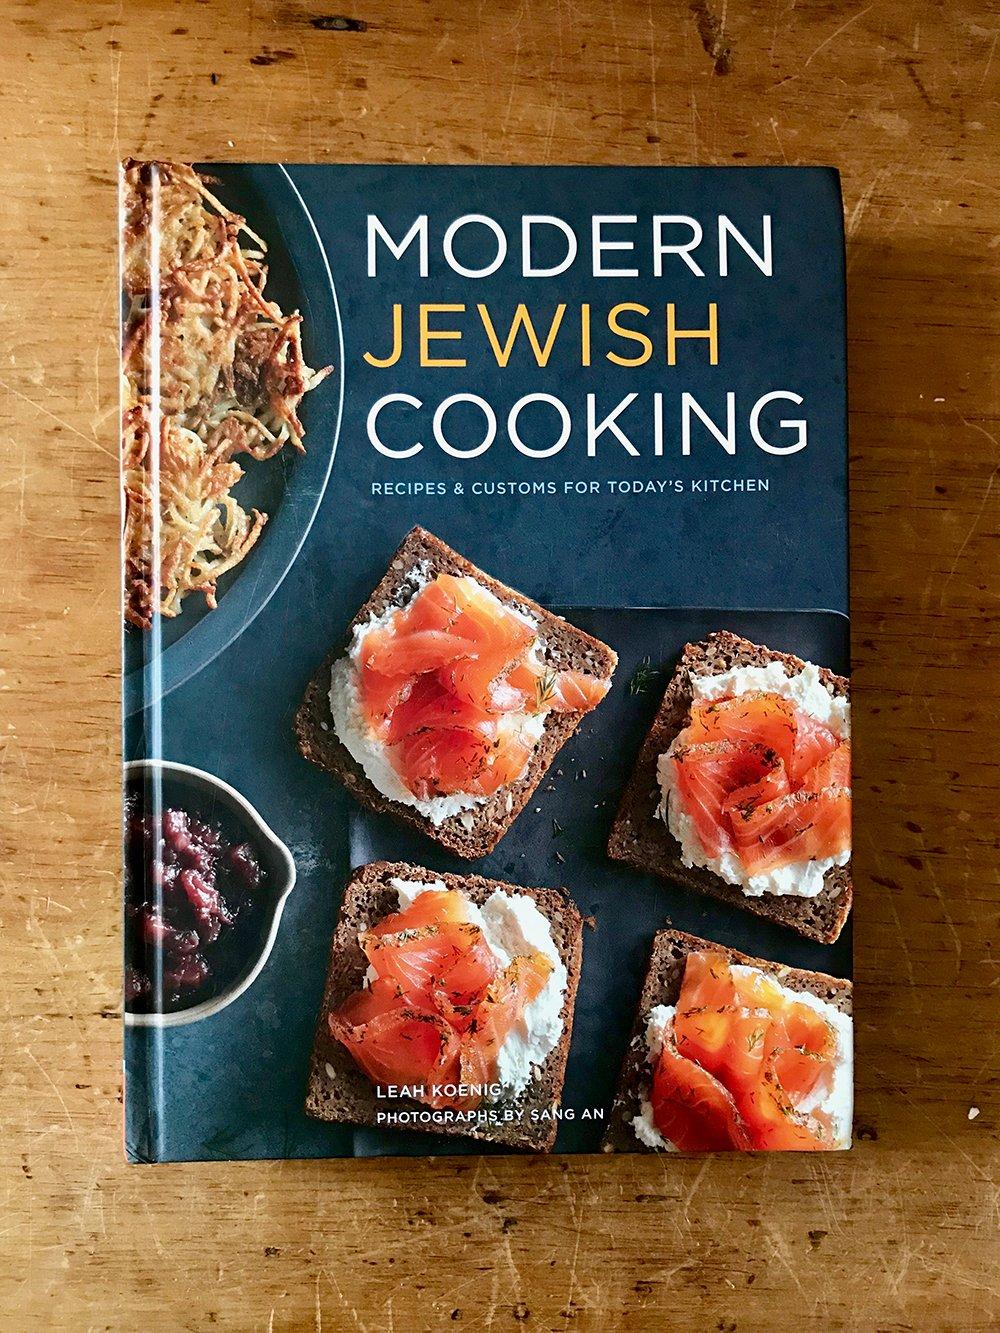 9 Cookbooks That Earn Their Keep